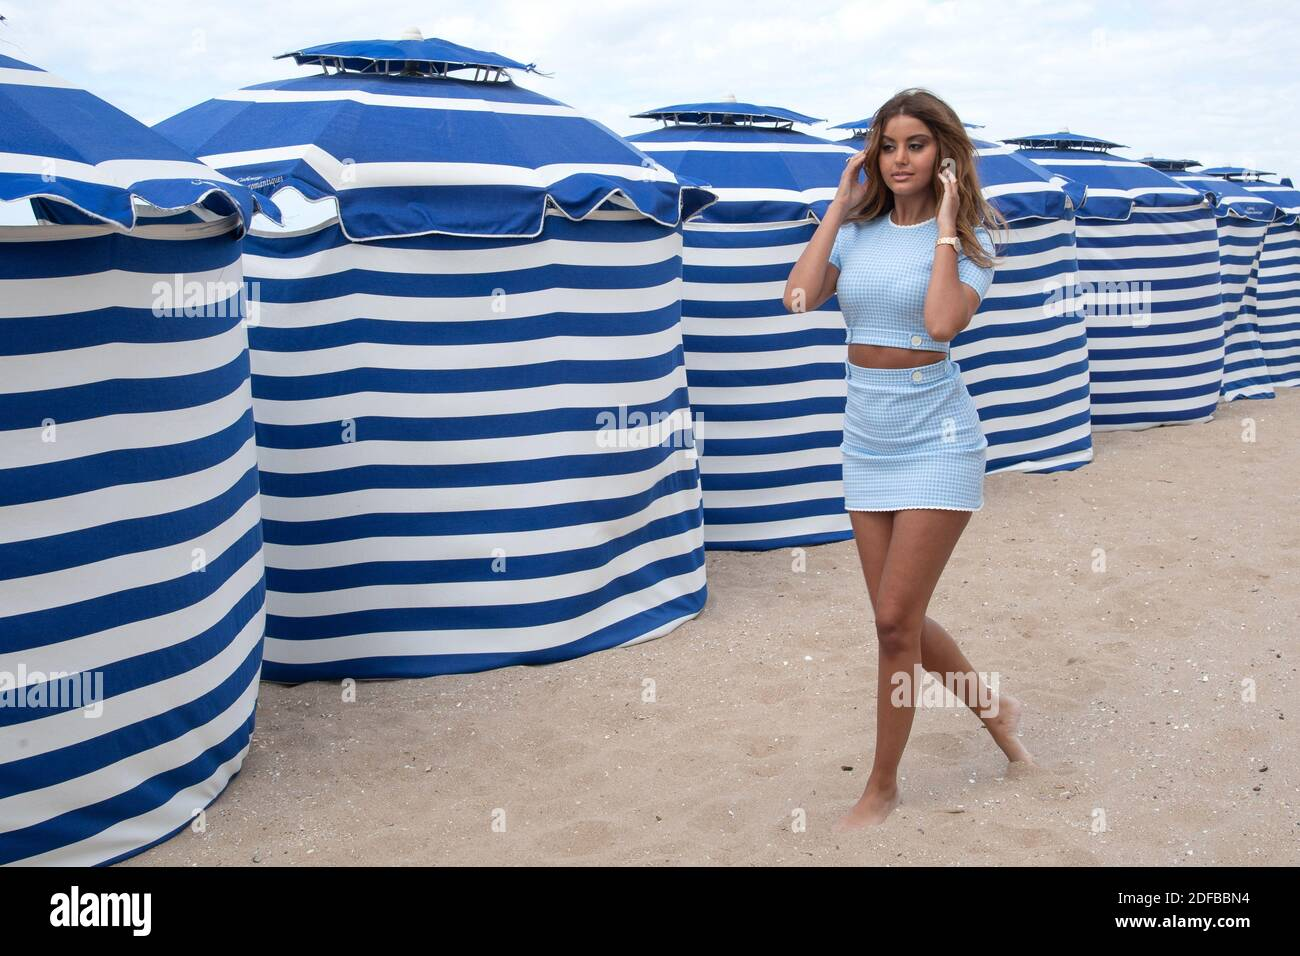 Beach zahia dehar Underage prostitute